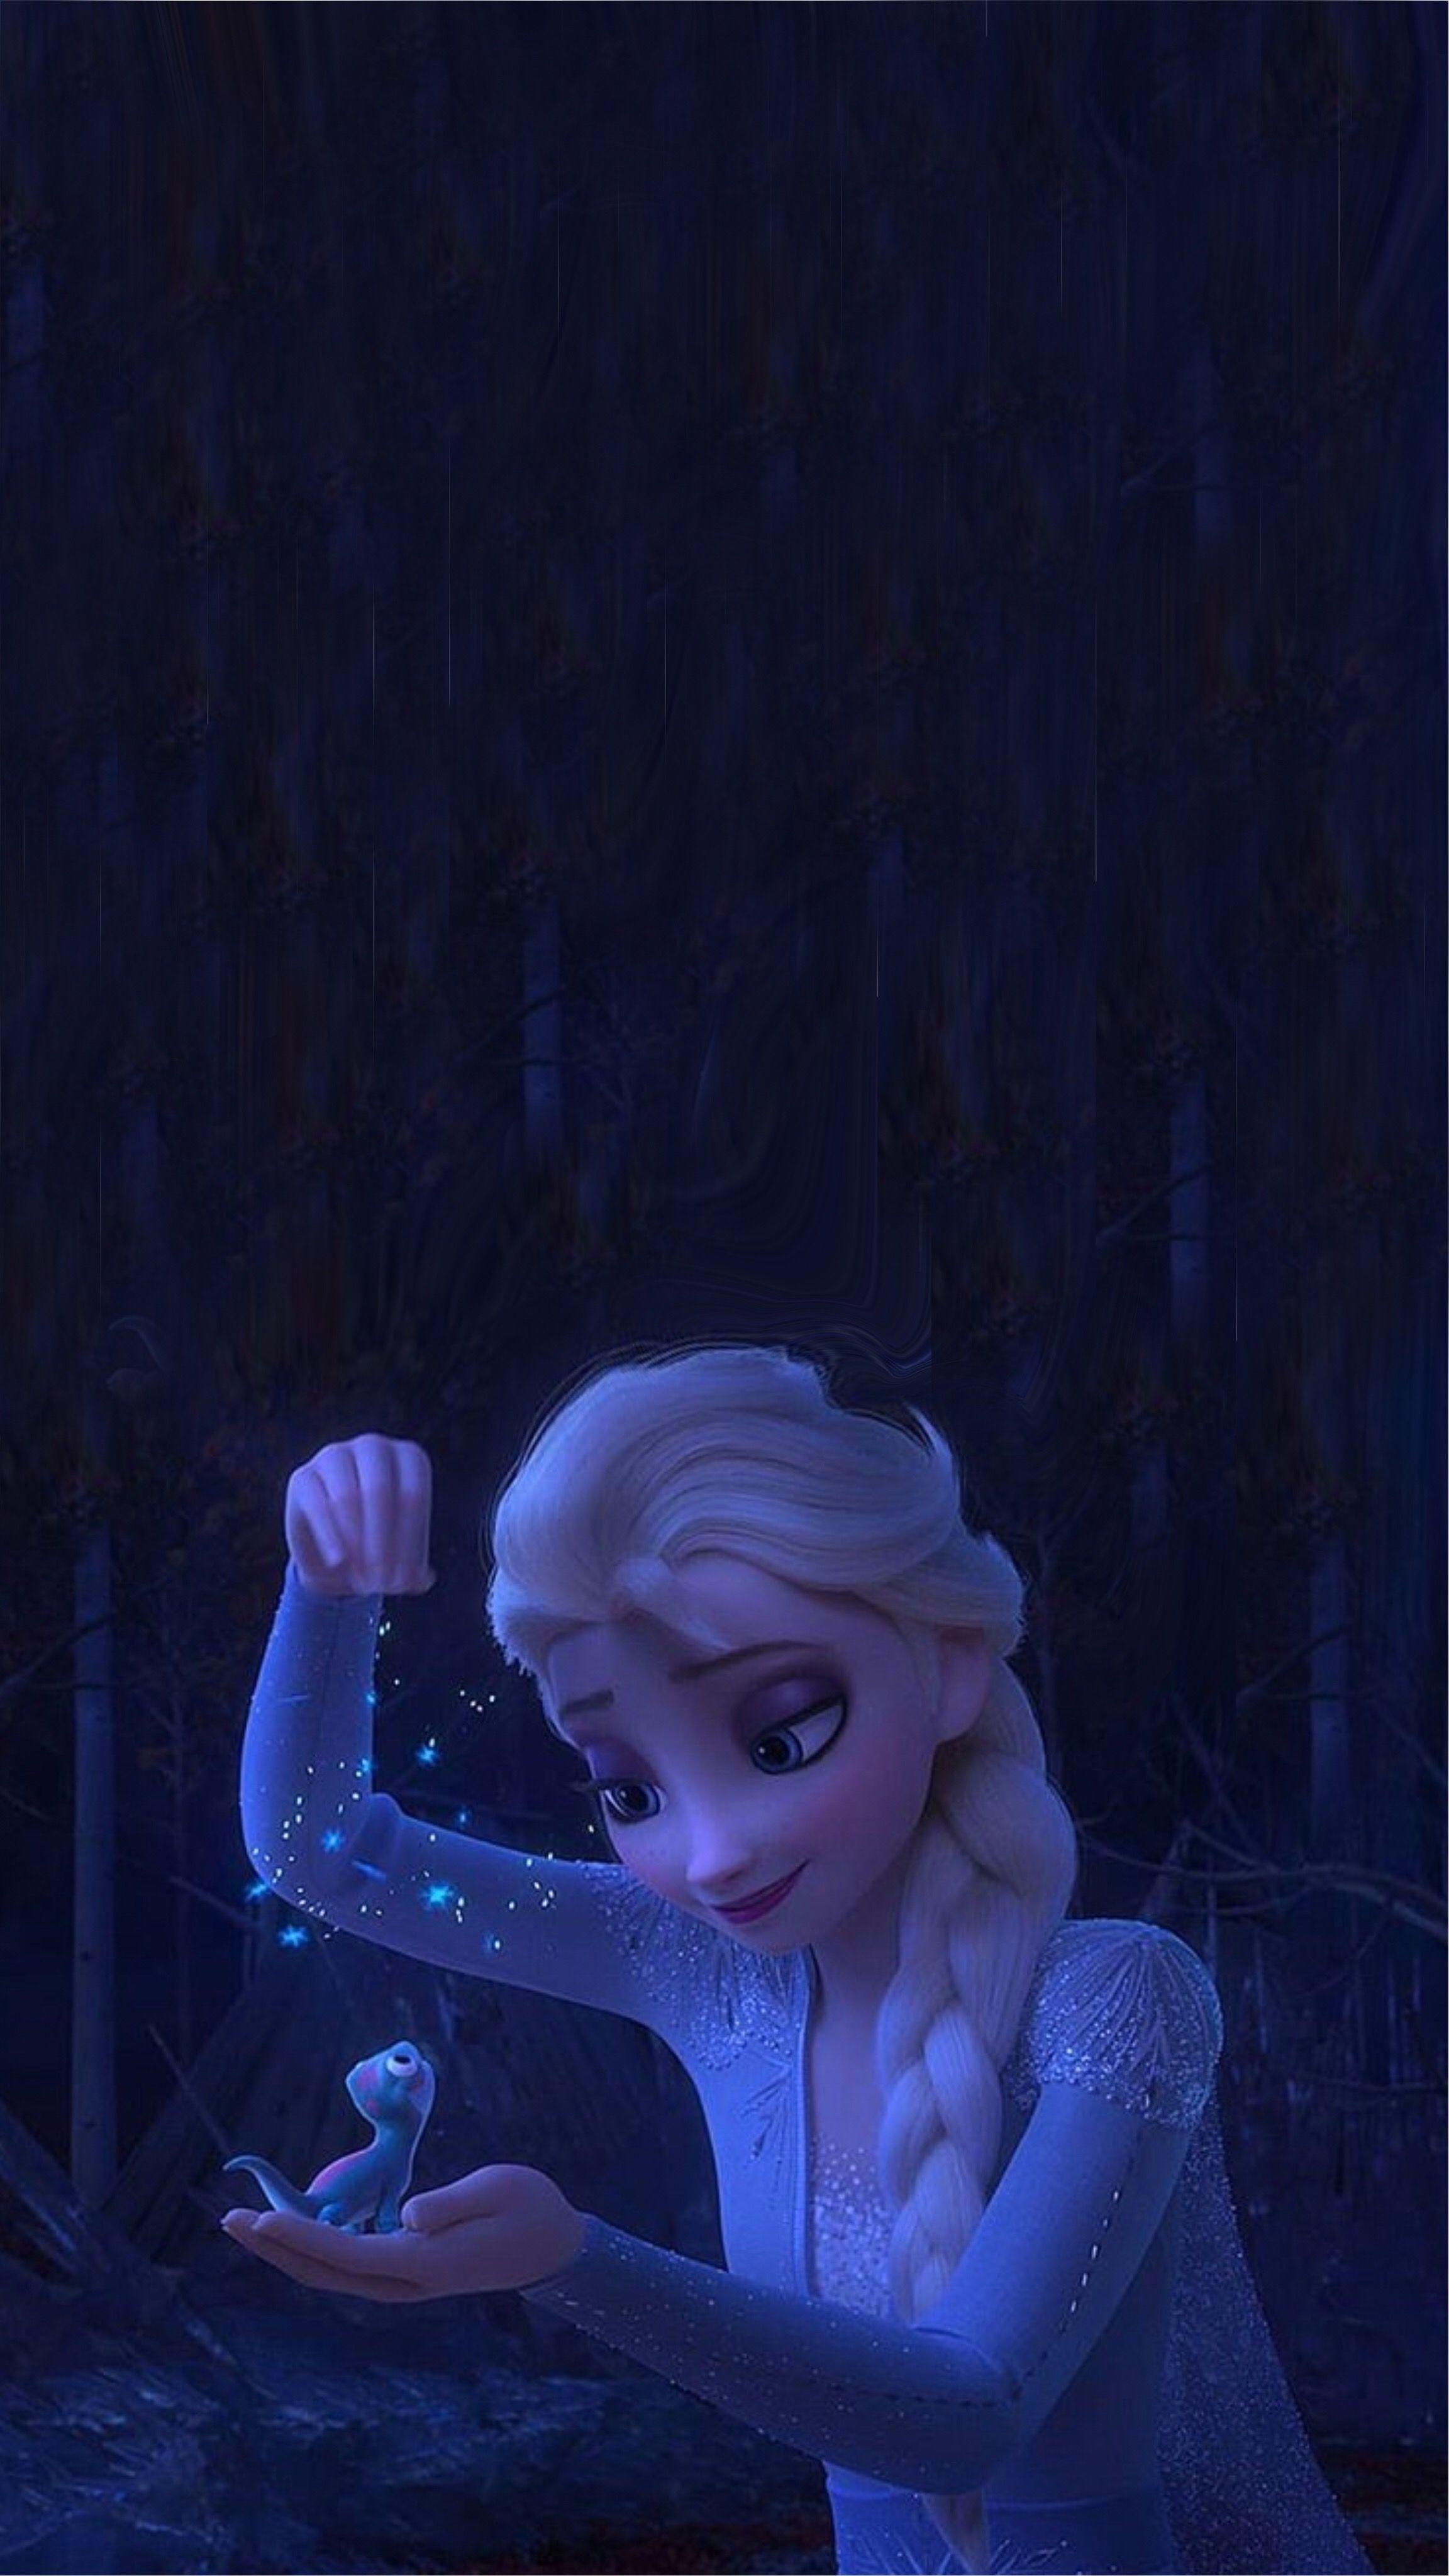 Moi Quan Je Calme Ma Bff In 2020 Disney Princess Drawings Disney Princess Pictures Disney Princess Frozen